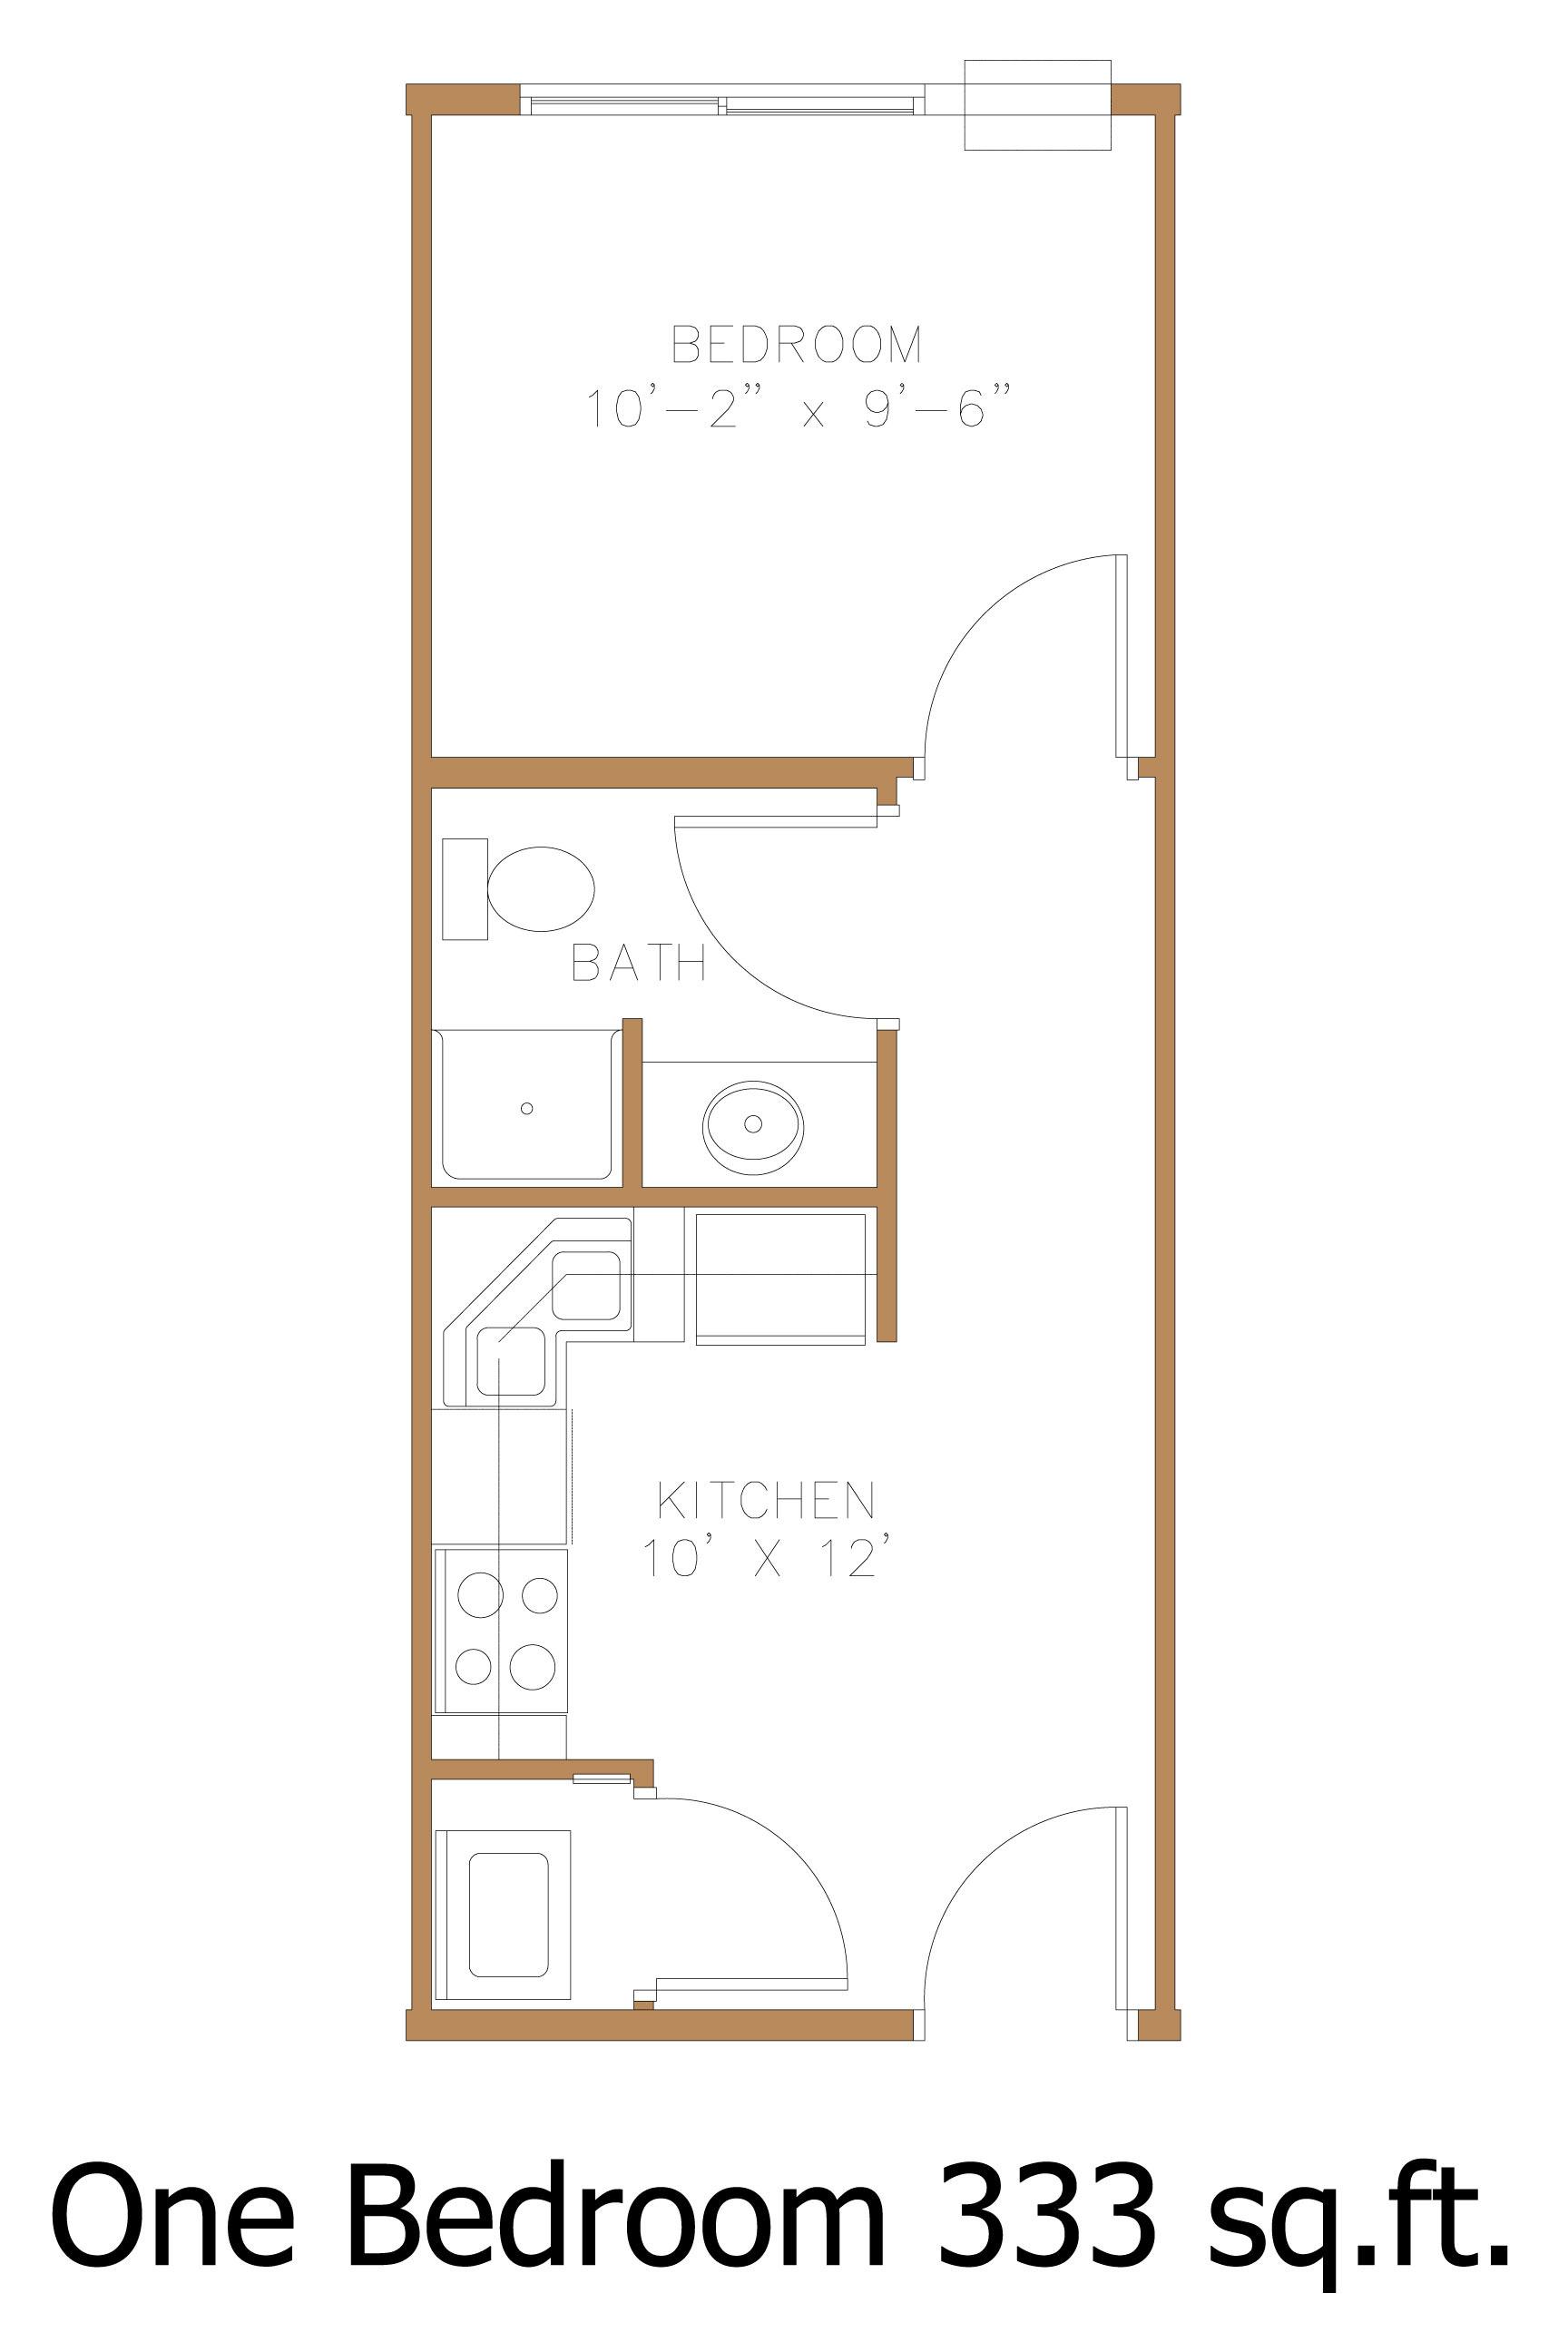 Beautiful bedroom floor plans house floor ideas for 3 bedroom floor plan with dimensions pdf